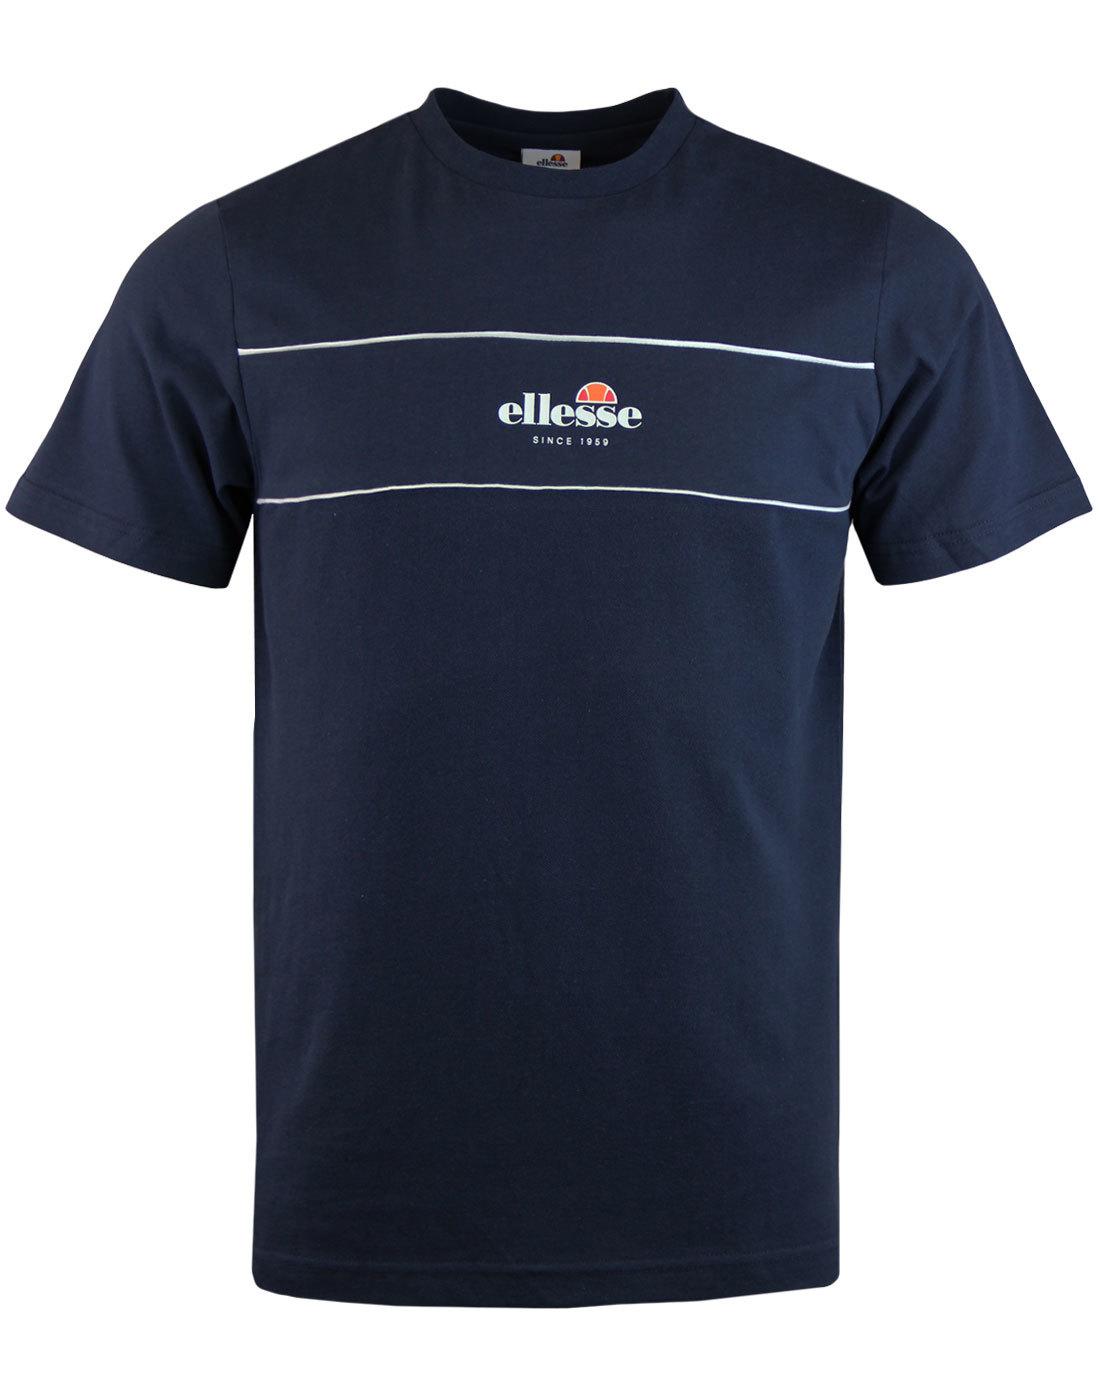 Cannavaro 70s Retro ELLESSE T-Shirt Dress Blue